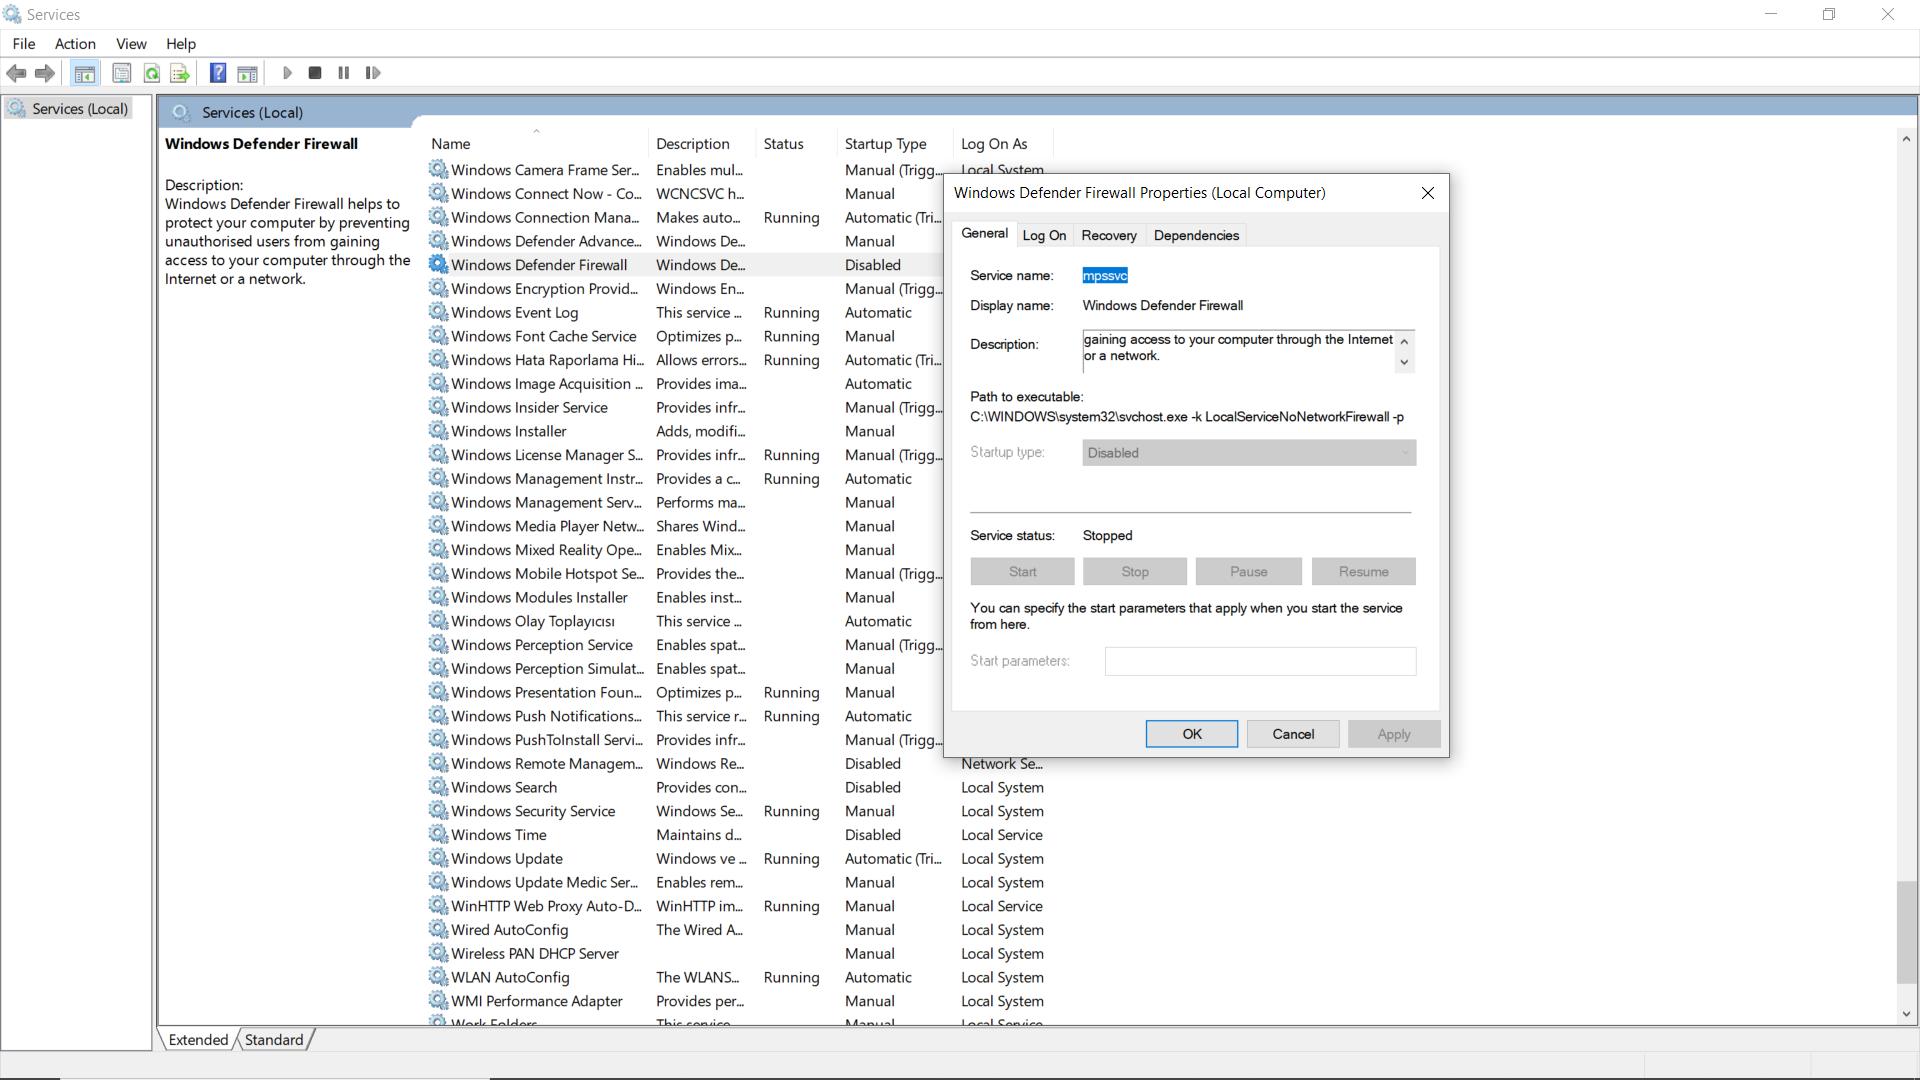 I can't change Windows Defender Firewall settings in services 4cfed1ec-c8e8-4c5b-941d-27b8115c101d?upload=true.png